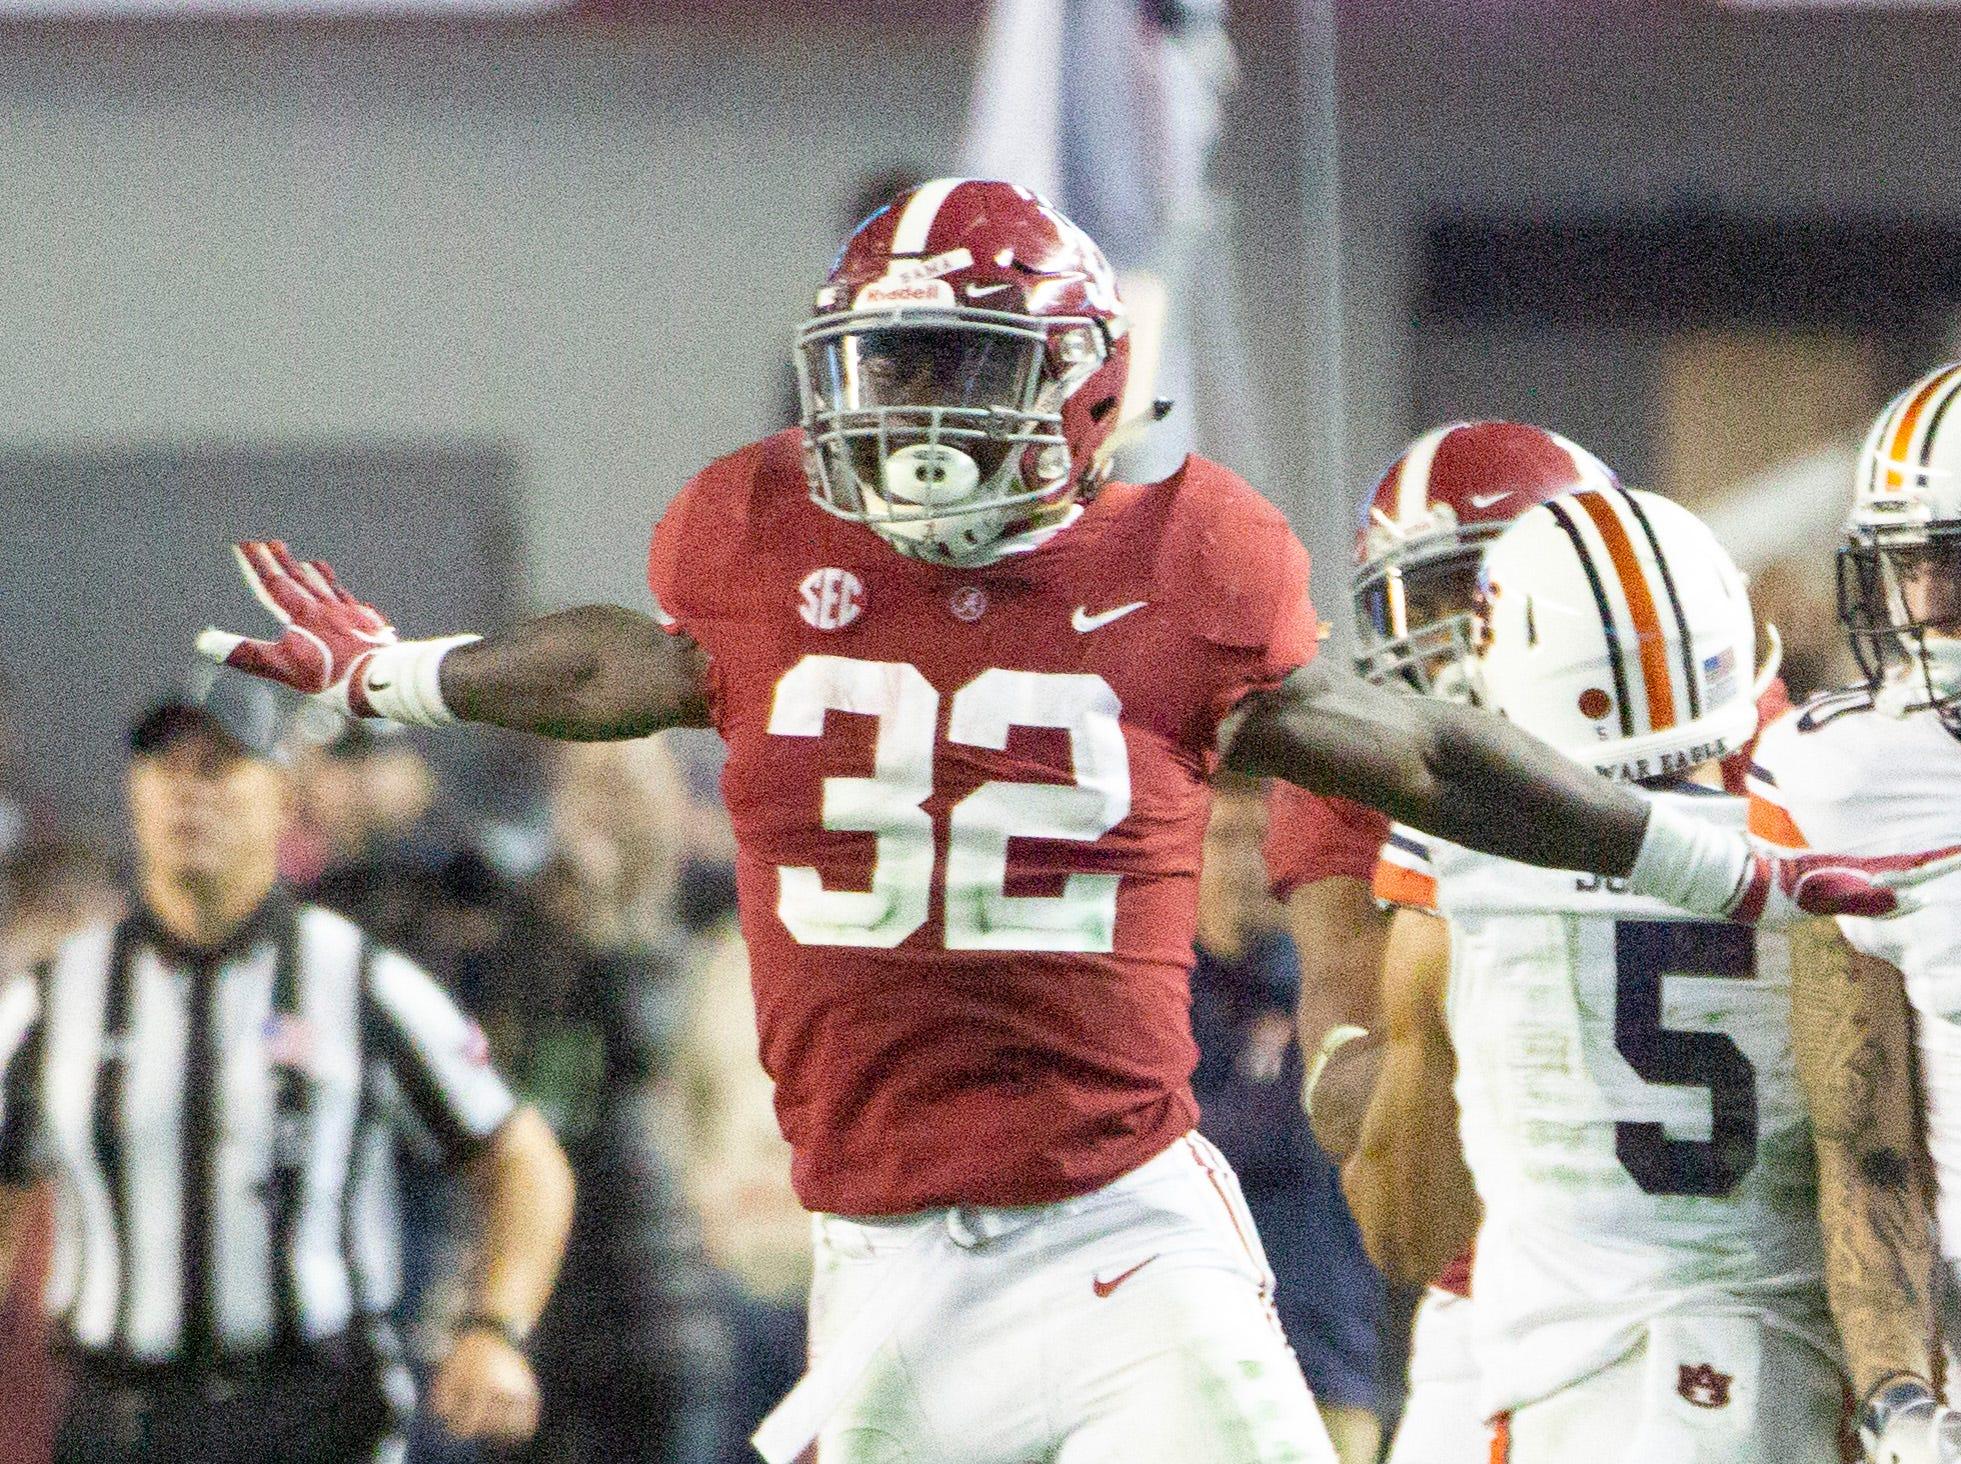 Alabama's Dylan Moses celebrates his tackle.